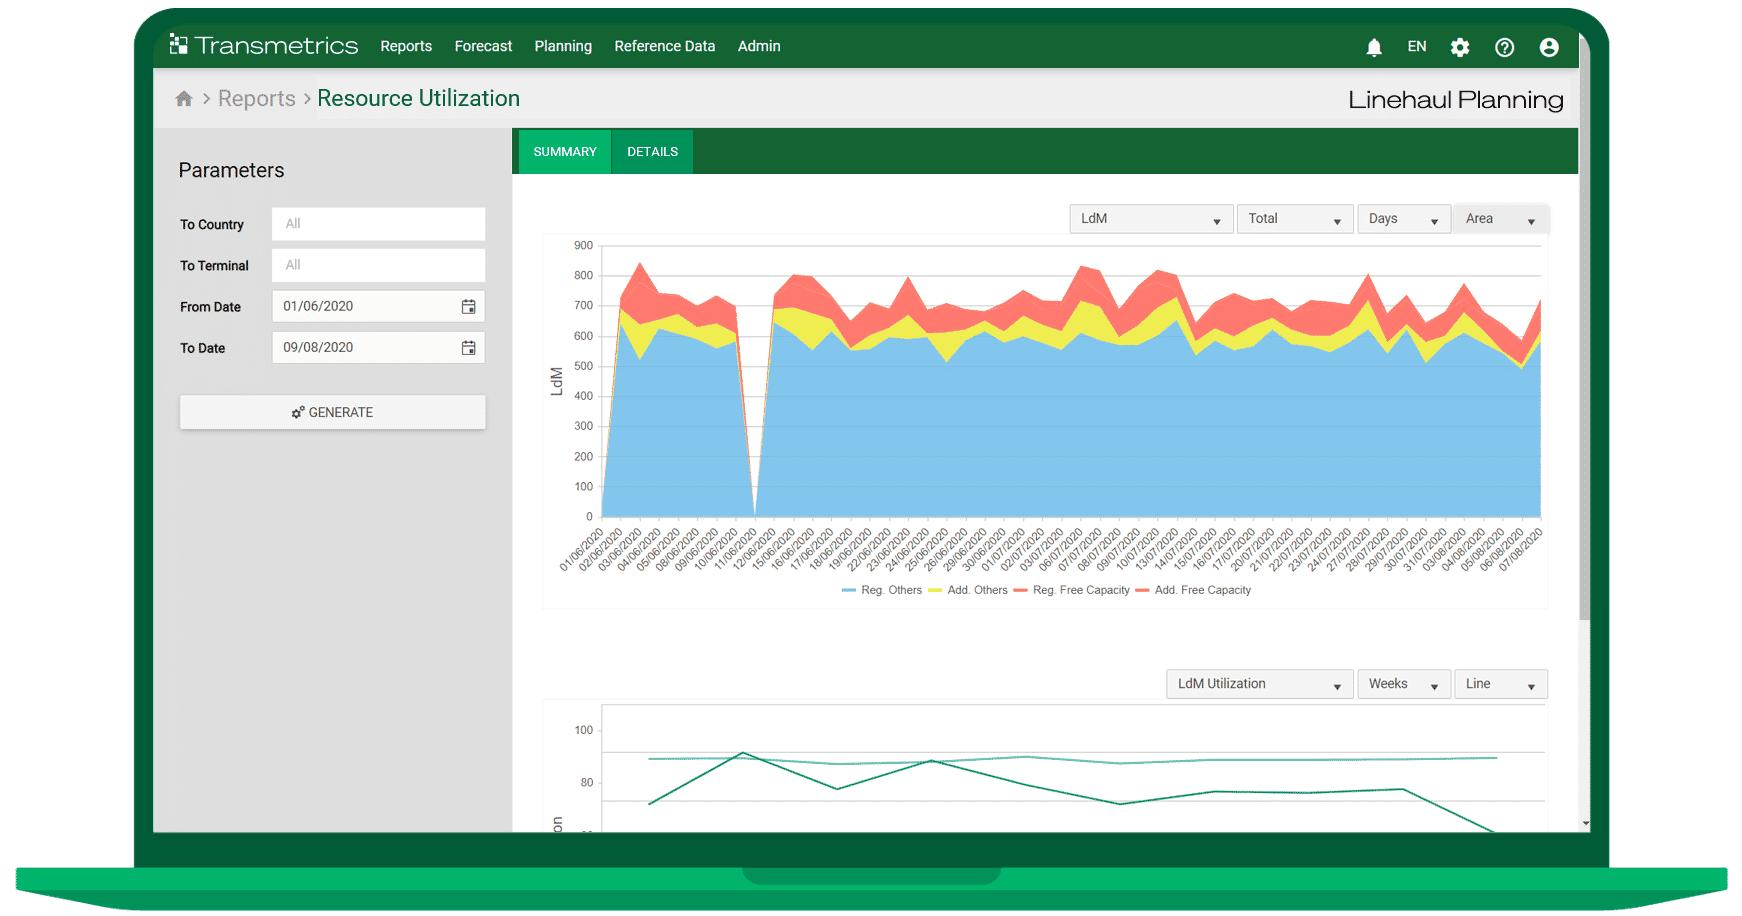 Transmetrics Linehaul Planning Solution: Resource Utilization Screen